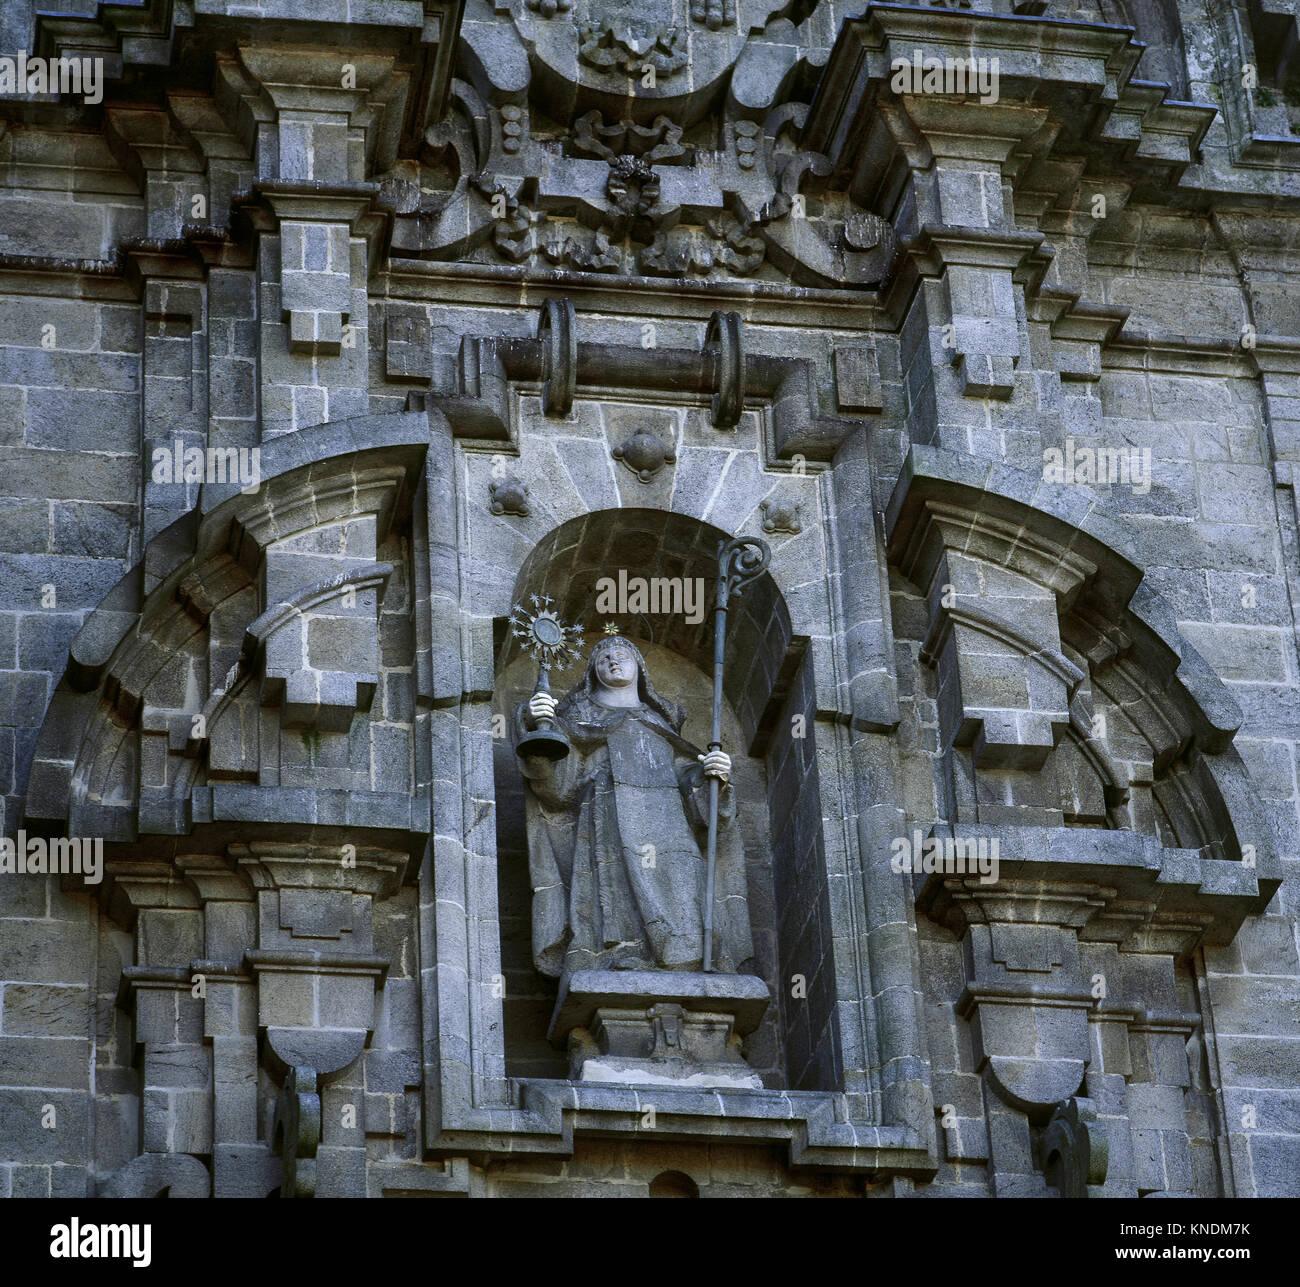 Statue of Clare of Assisi (1194-1253). Italian saint. Baroque facade of da Igrexa, by Simon Rodriguez, 1719. Convent - Stock Image